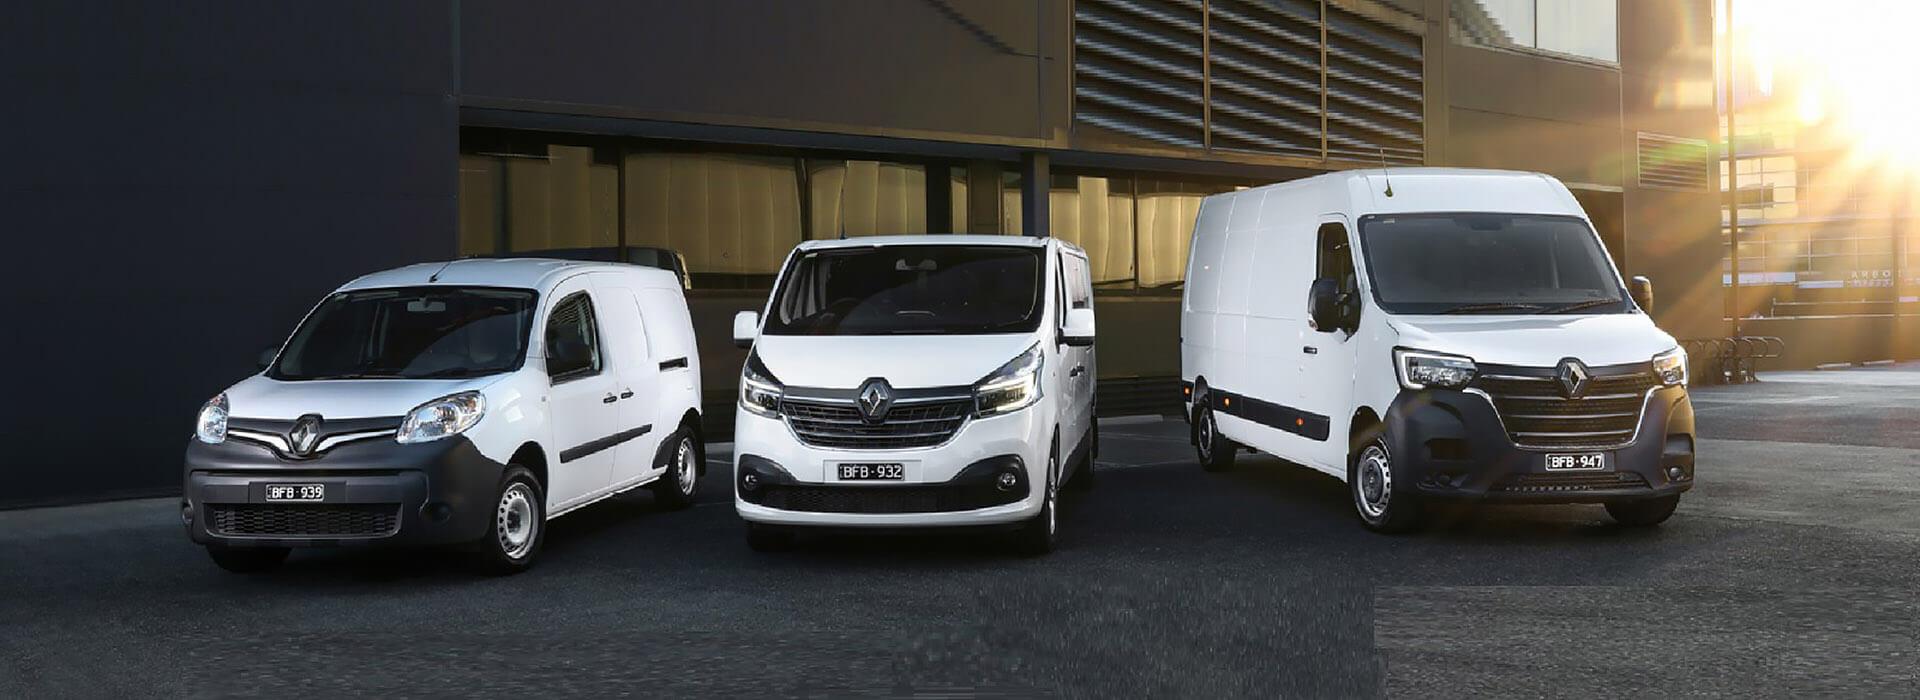 Cricks Maroochydore Renault Fleet